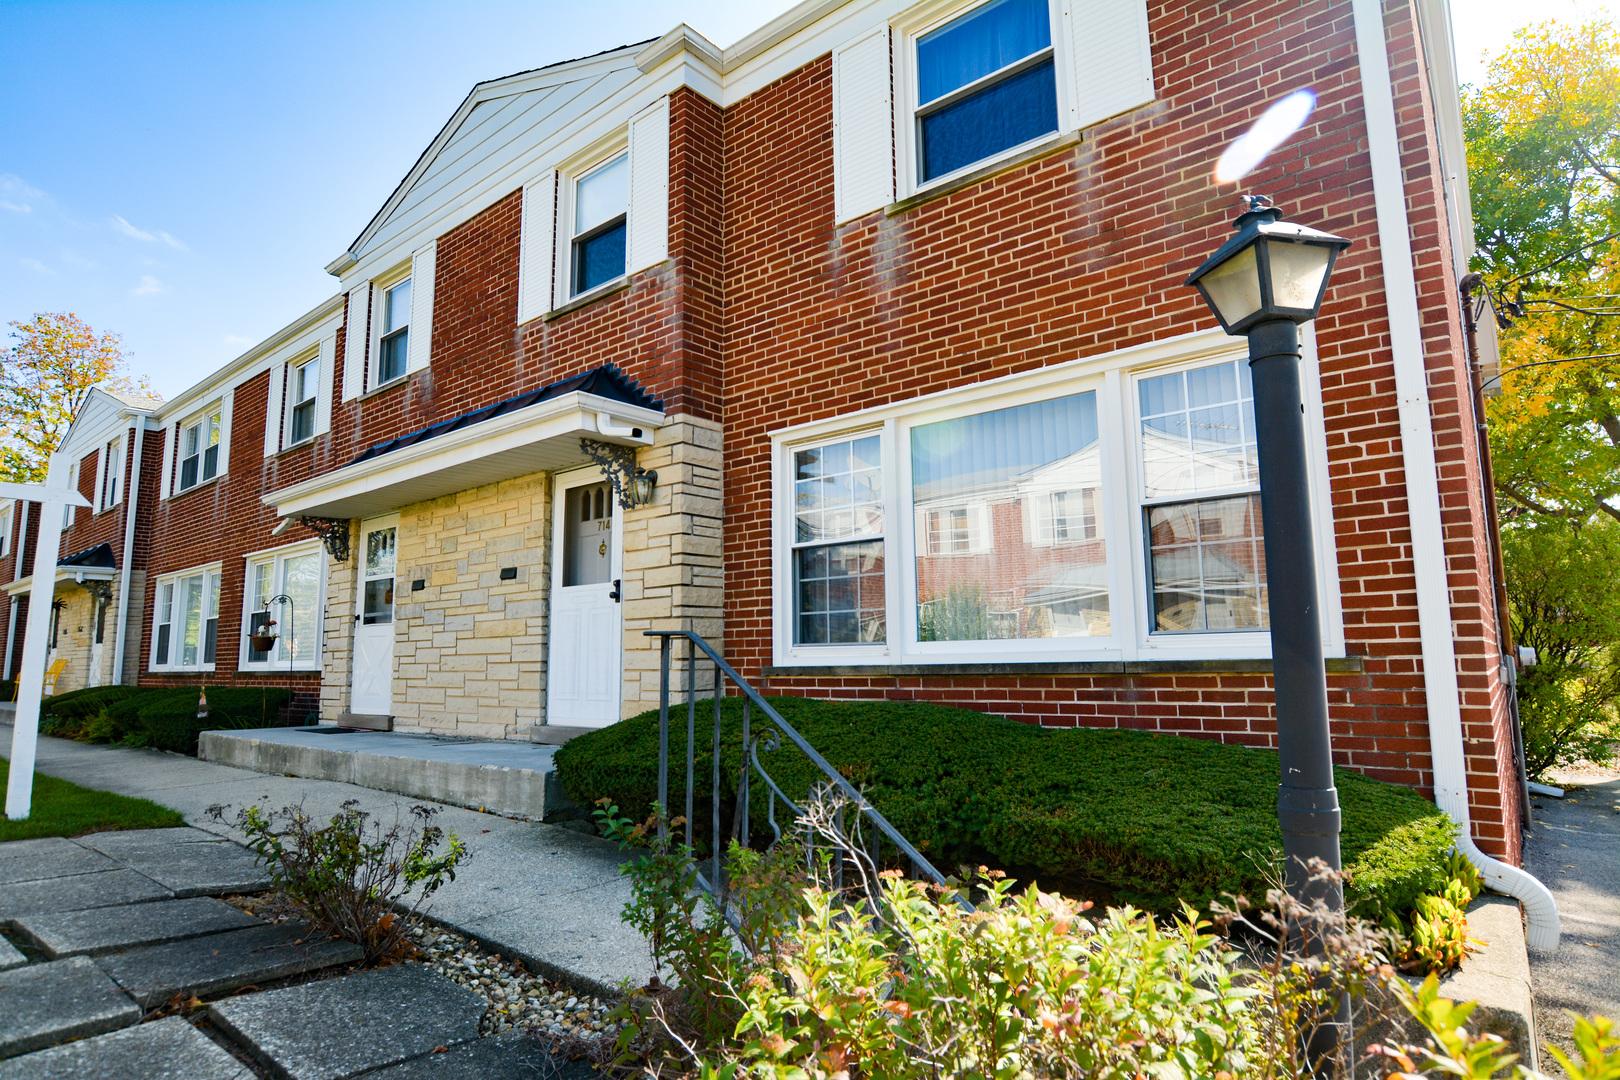 Park Ridge IL Real Estate And Park Ridge IL Homes For Sale